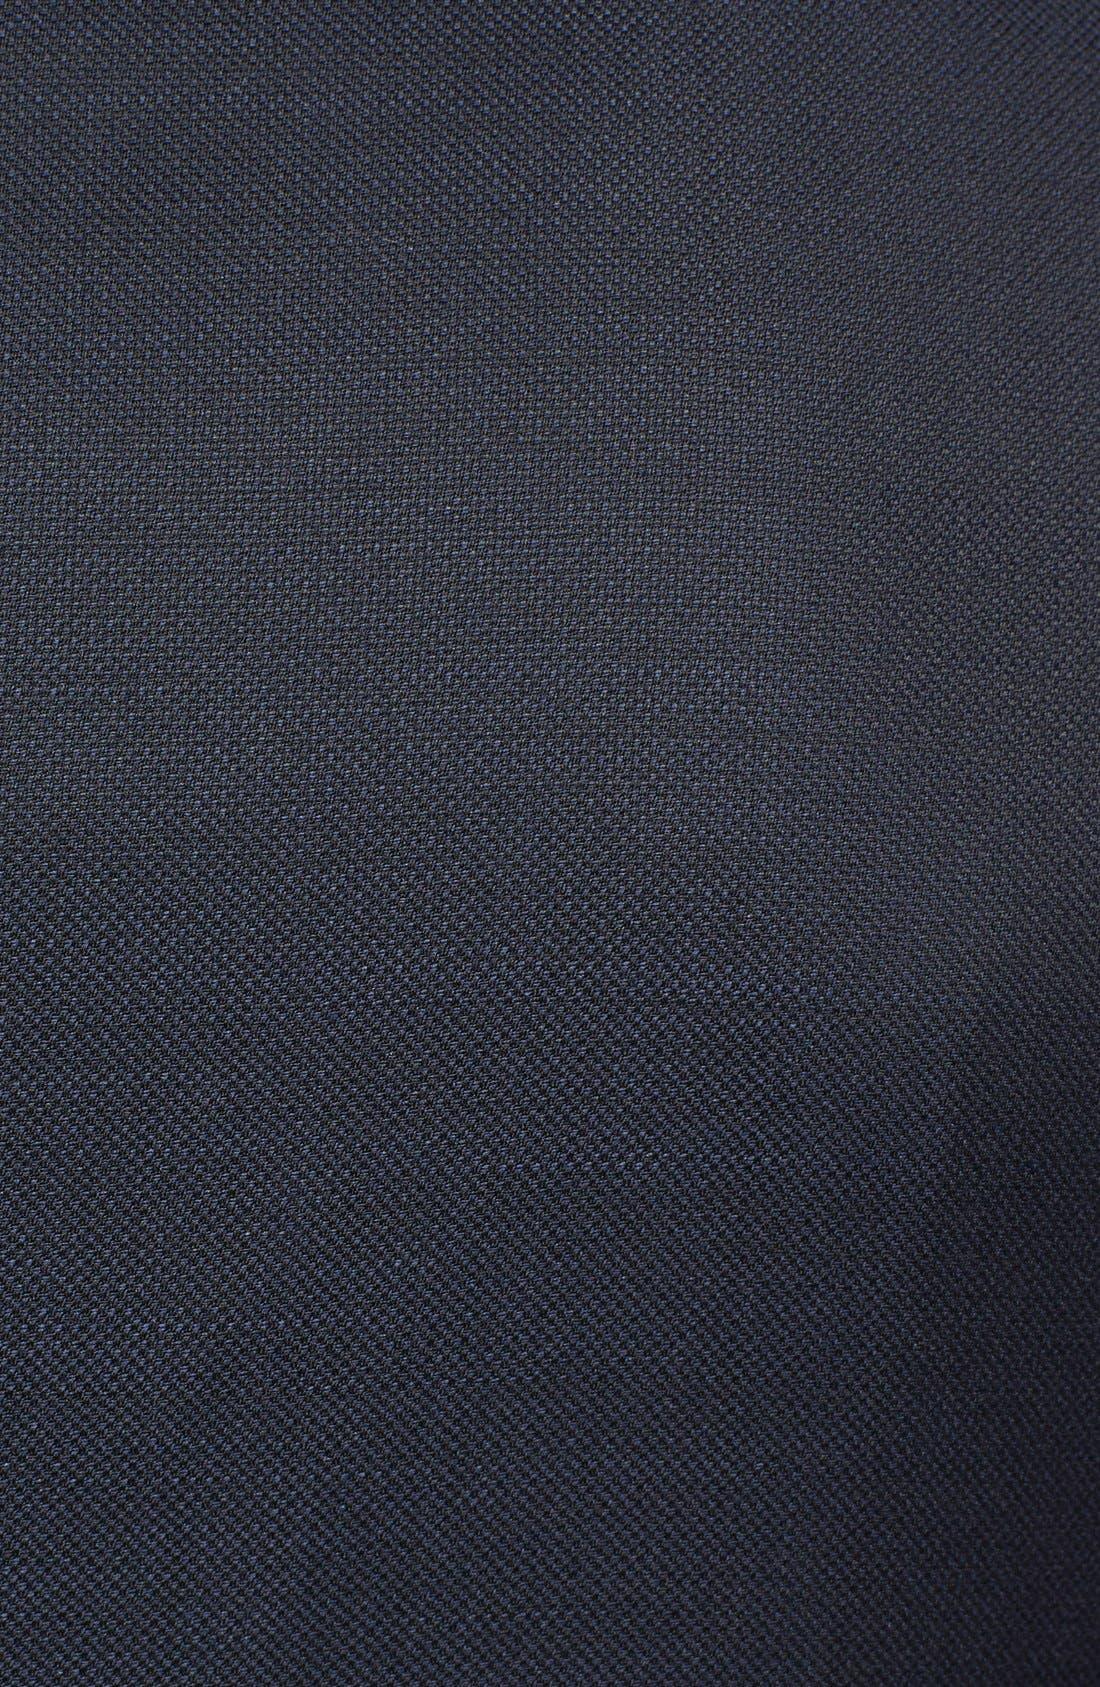 Alternate Image 3  - Todd Snyder 'May Fair' Trim Fit Wool Blazer